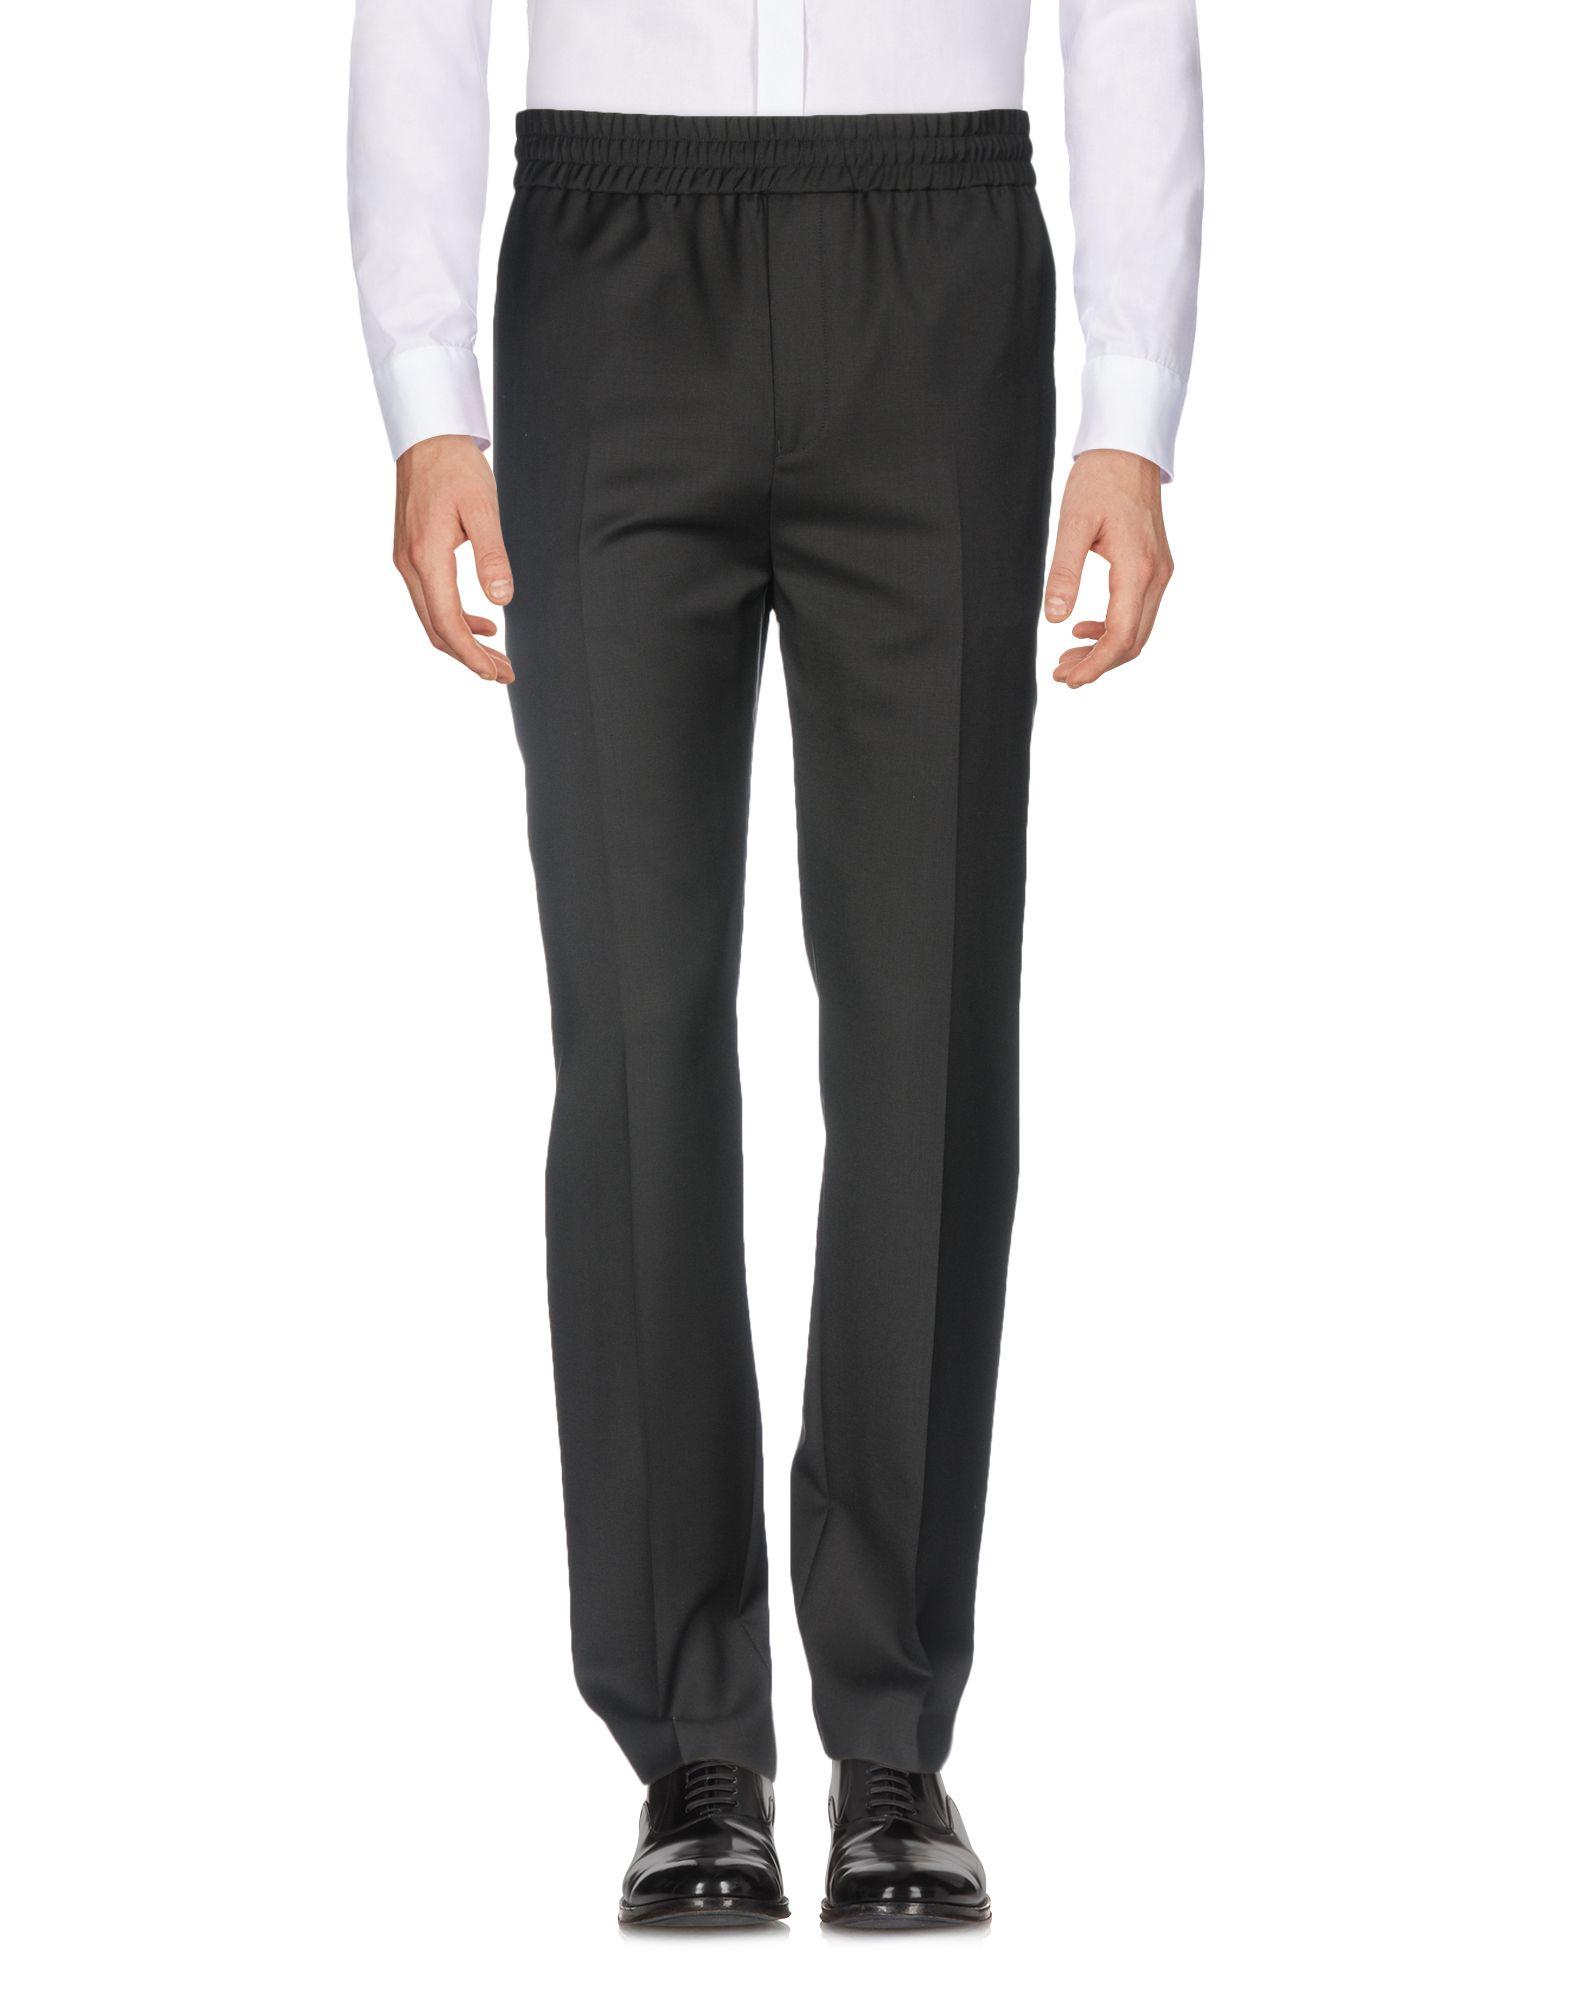 Pantalone Golden Goose Deluxe Brand Uomo - Acquista online su